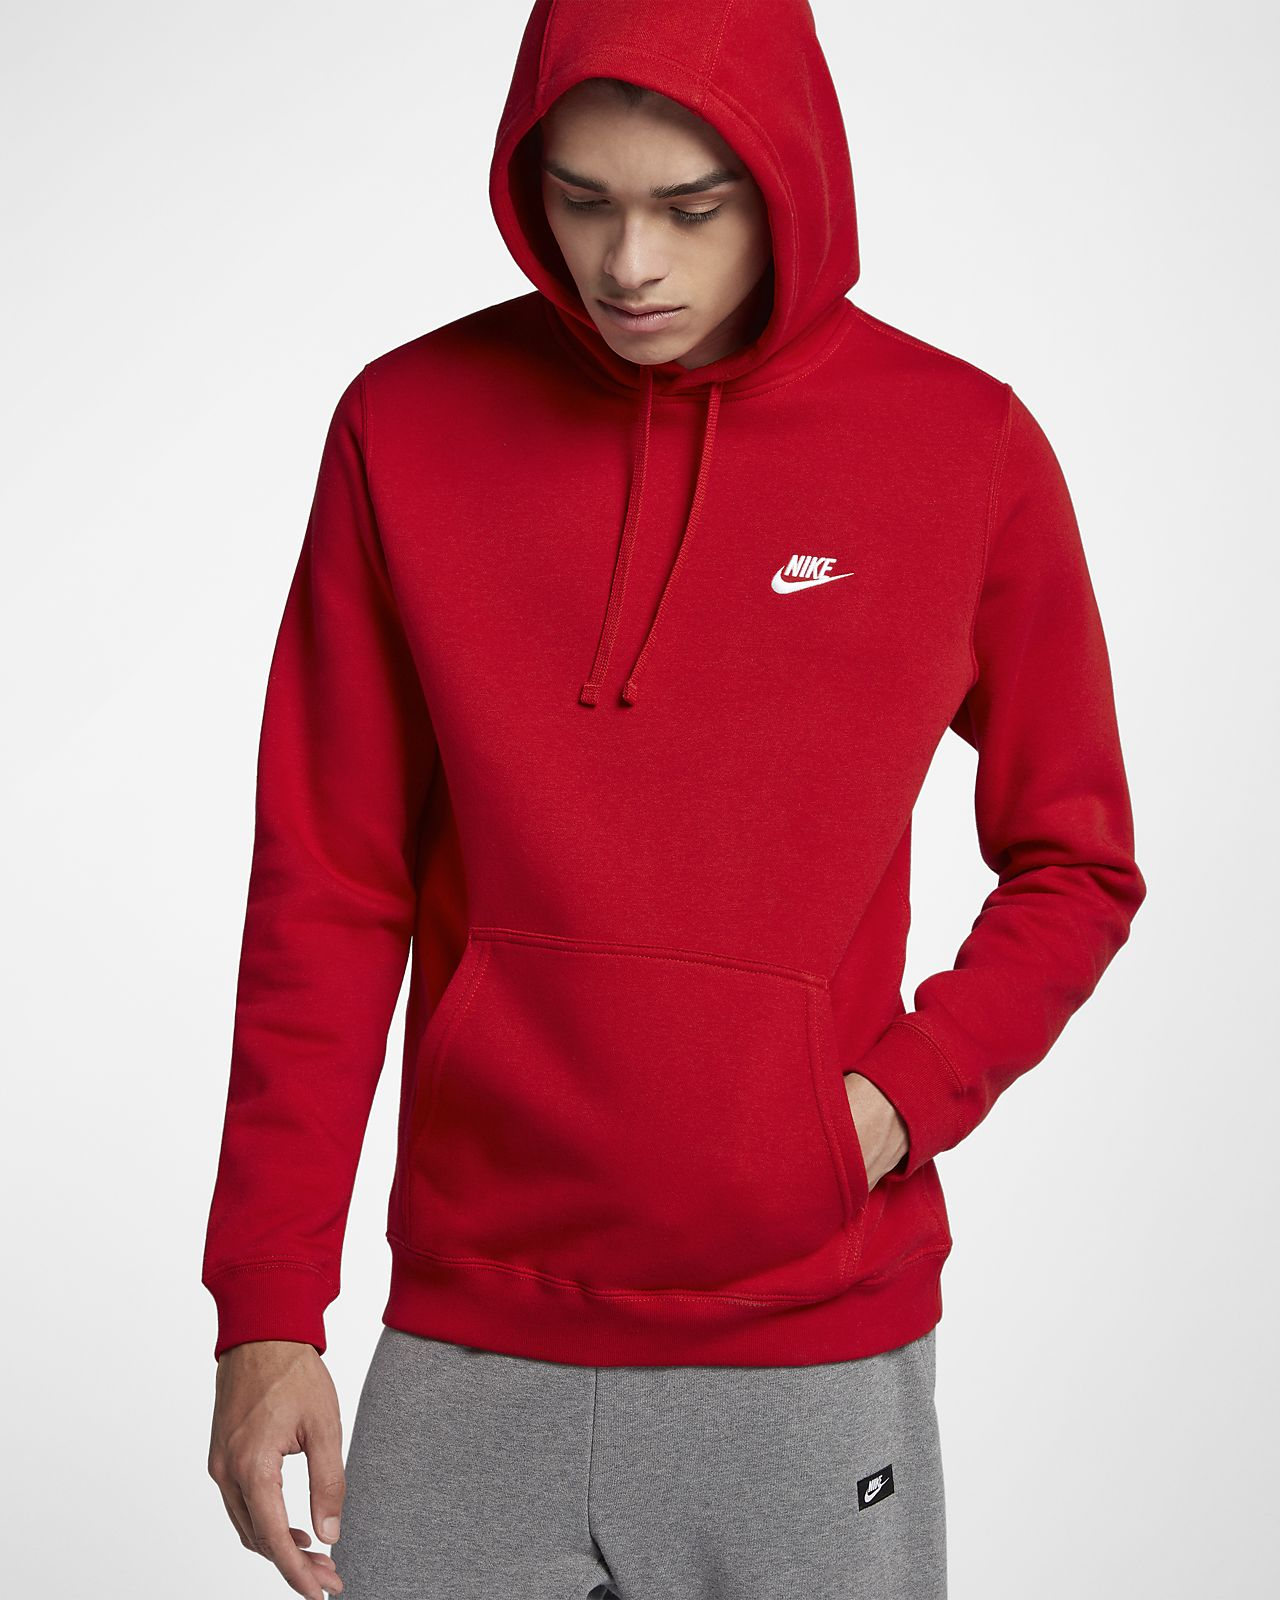 13d614cb6bfdc Nike Sportswear Club Fleece Pullover Hoodie. Nike.com